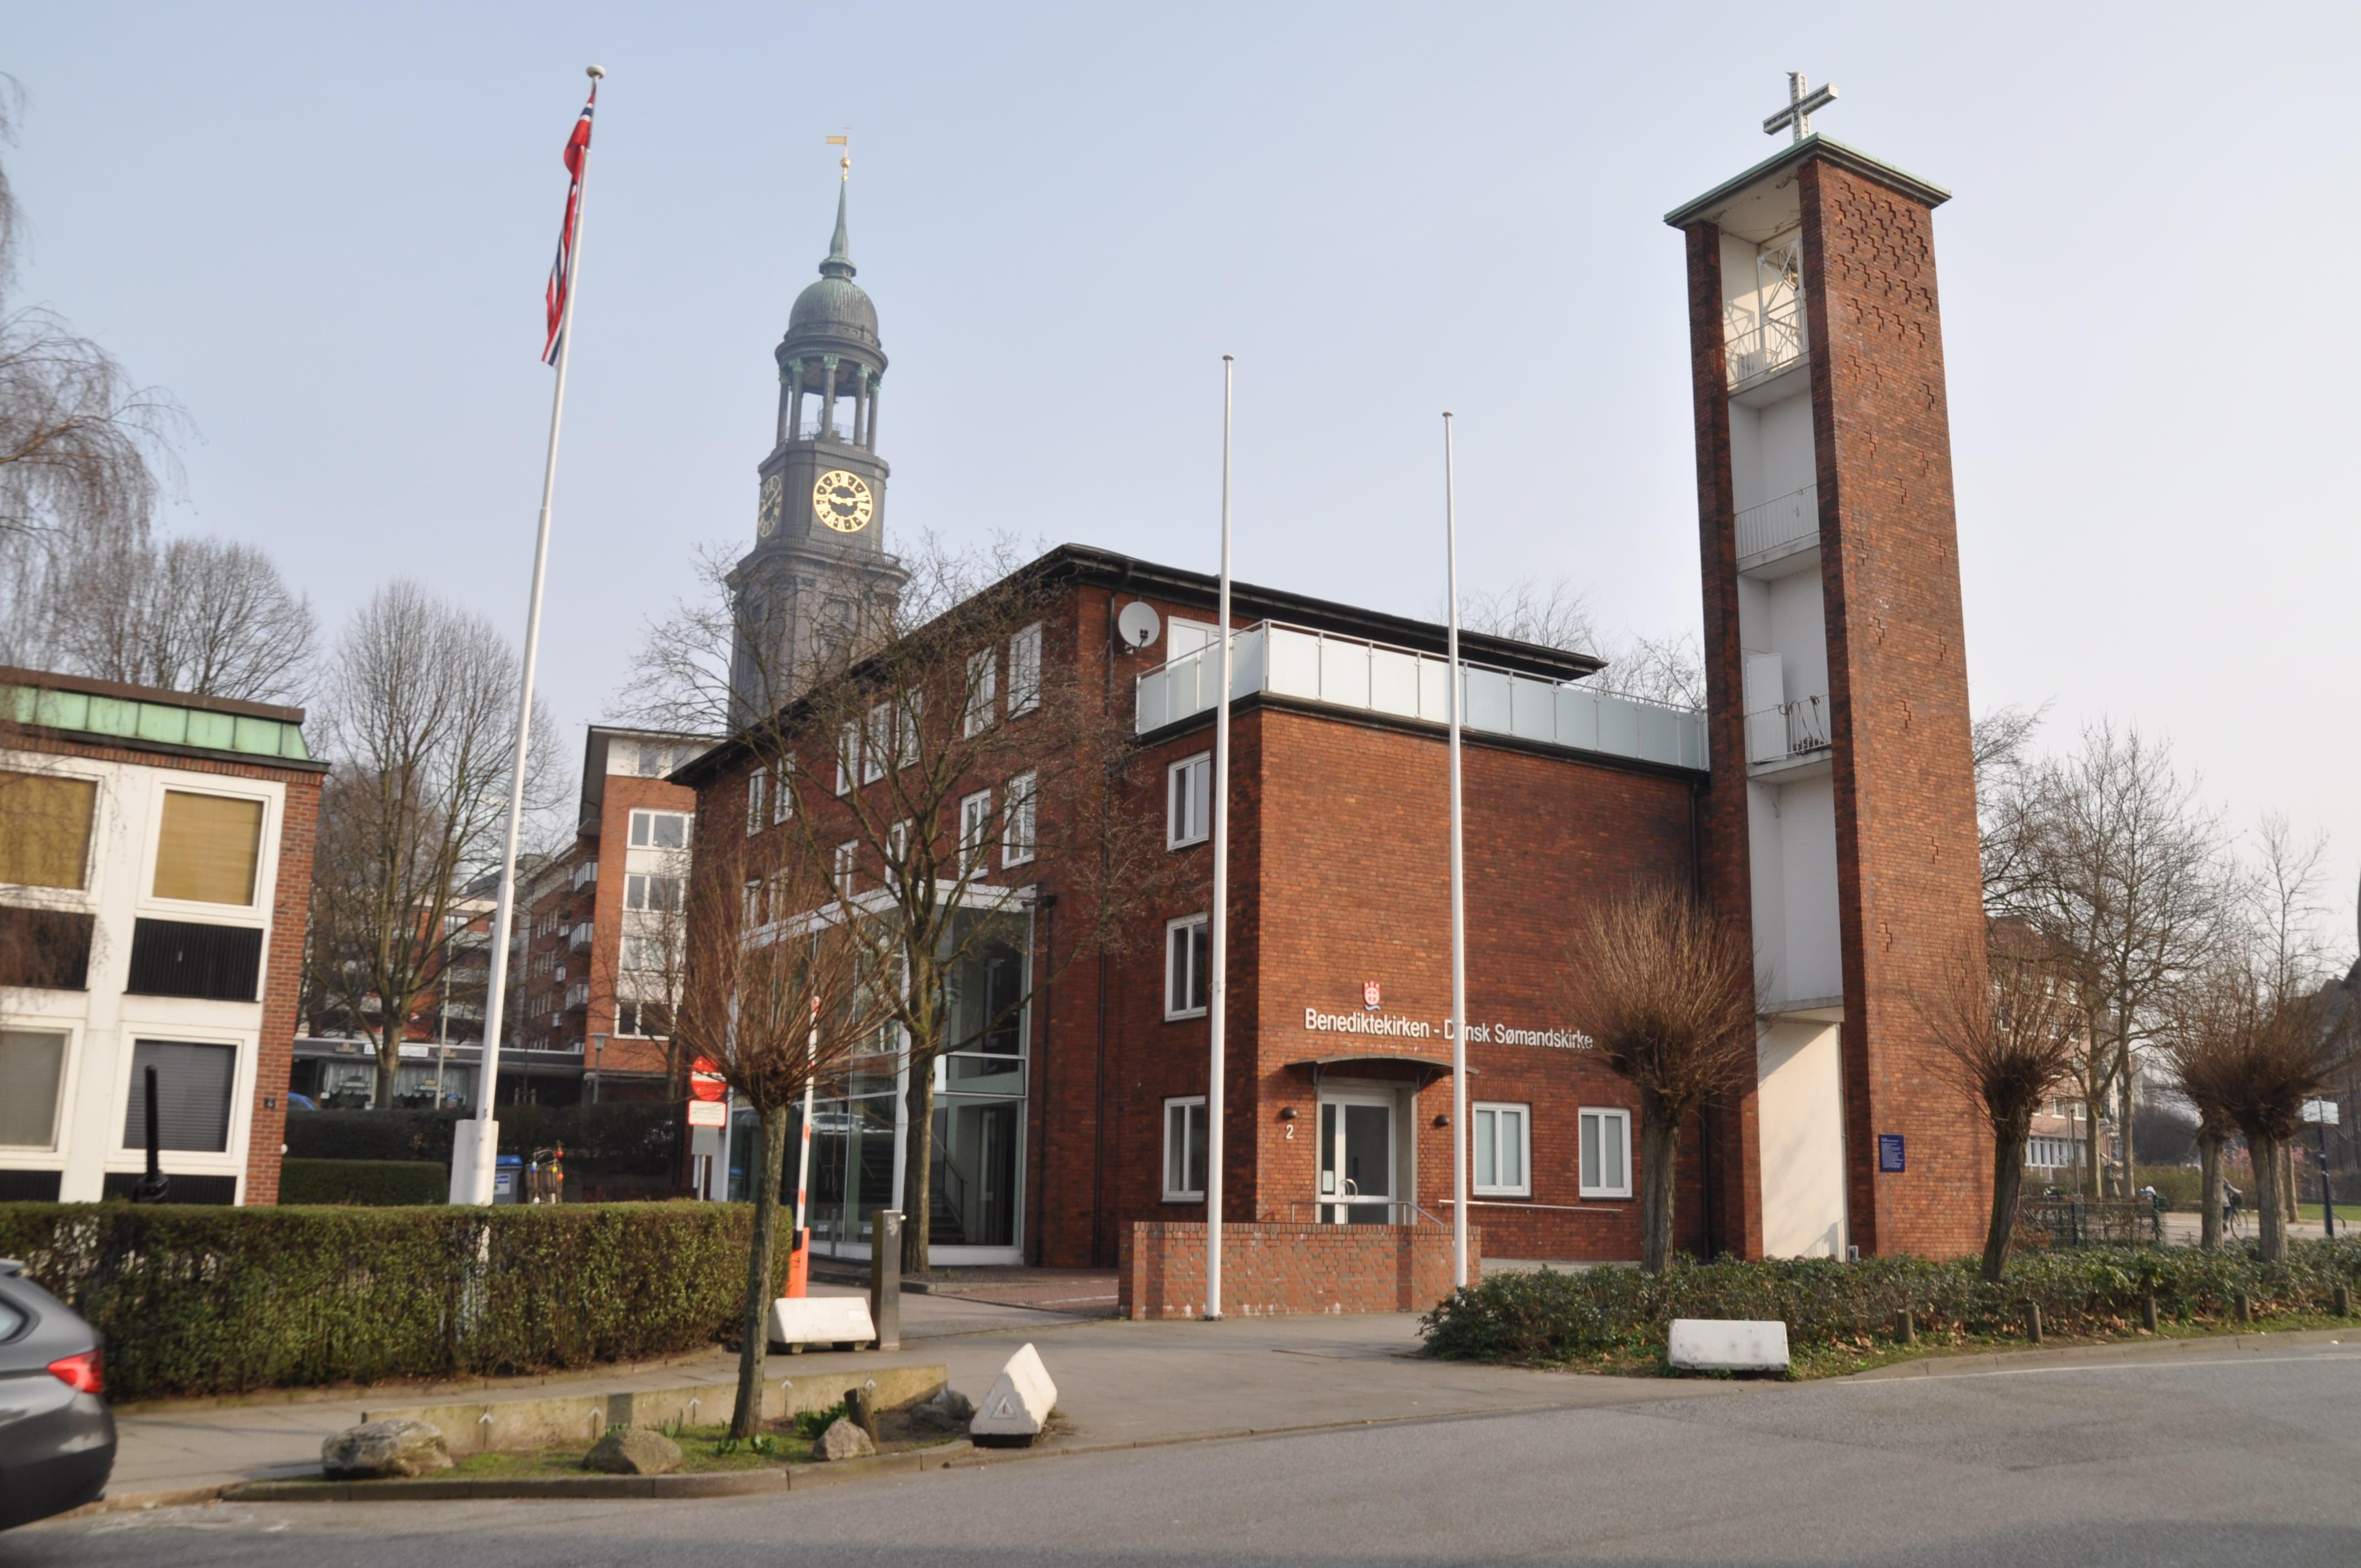 Dänische Kirche Hamburg